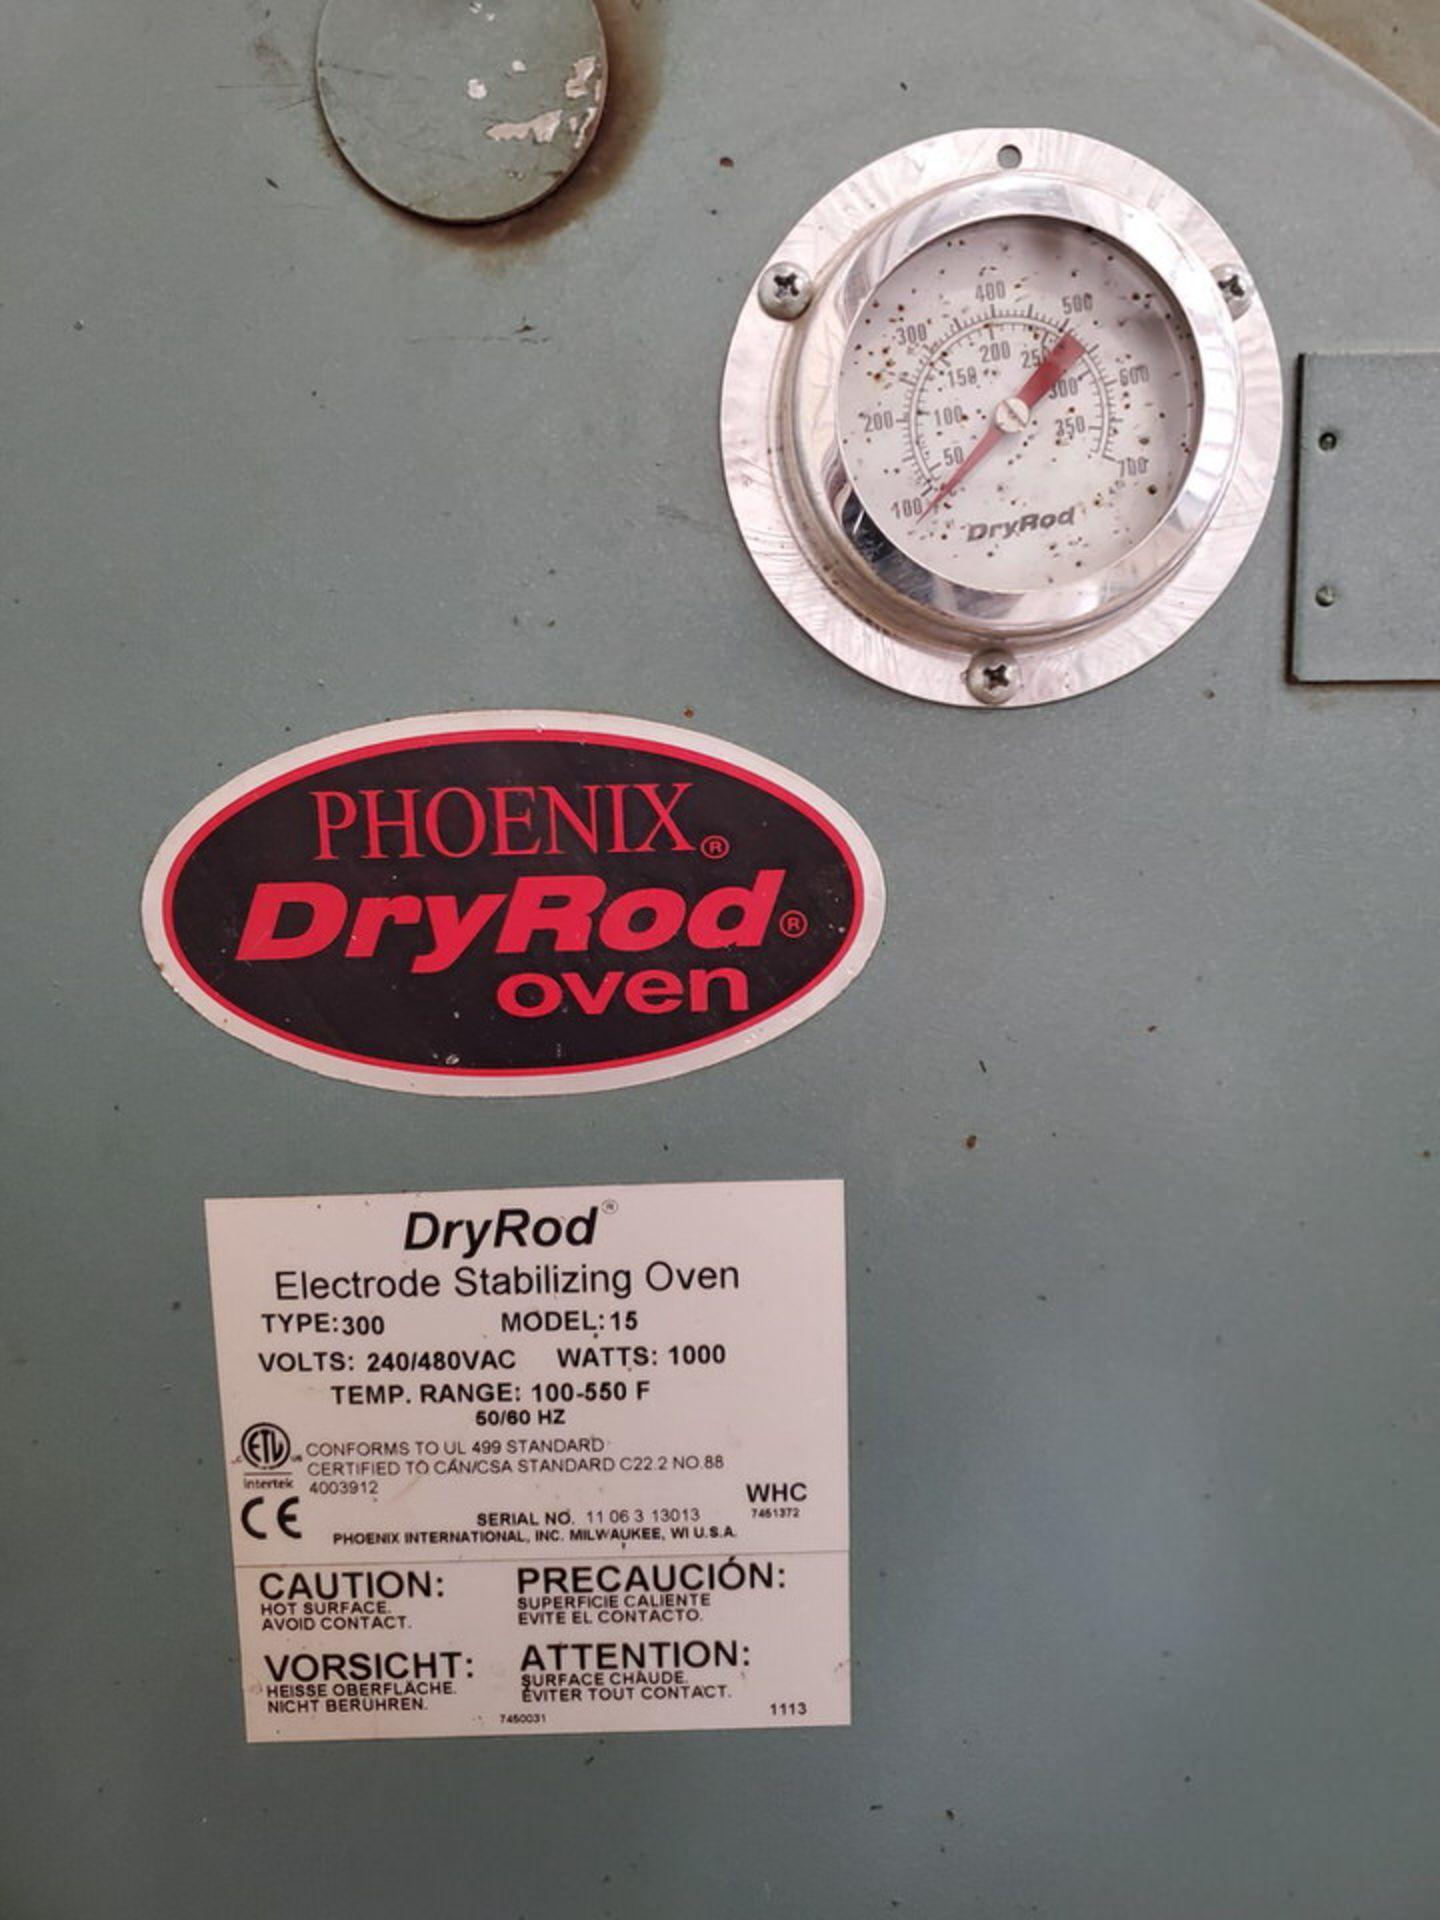 Phoenix 15 Dry Rod Oven 240/480V, 1,000W, 50/60HZ, Temp Range: 100-550F - Image 4 of 4